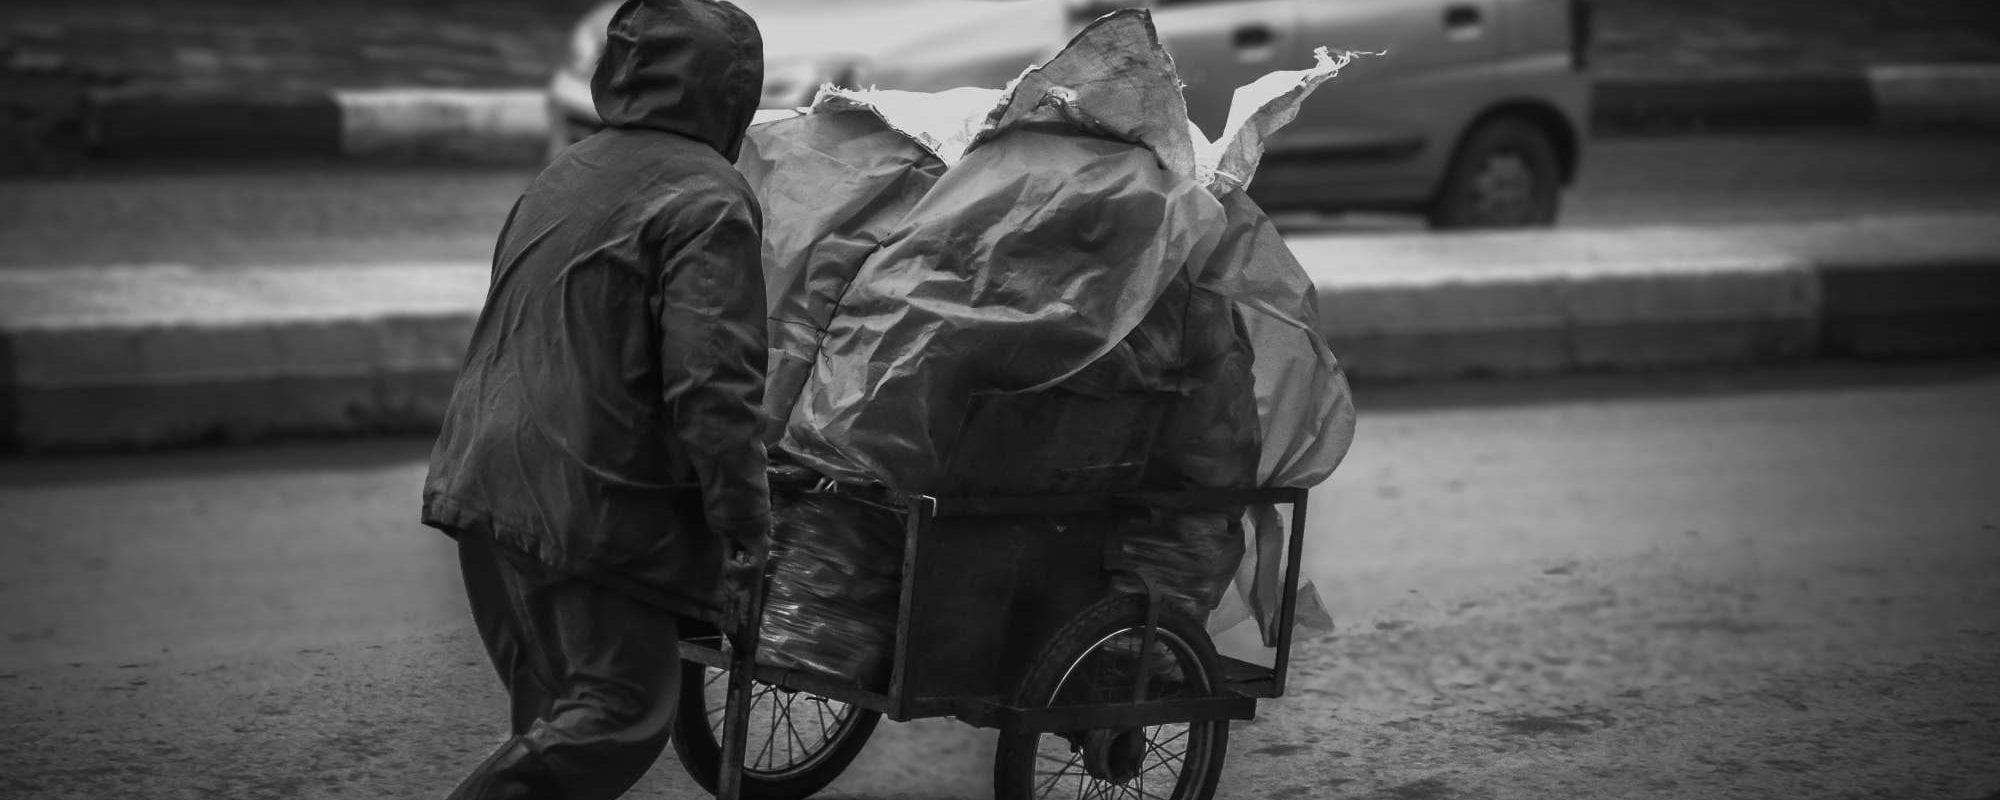 Homeless Man Pushing a Cart